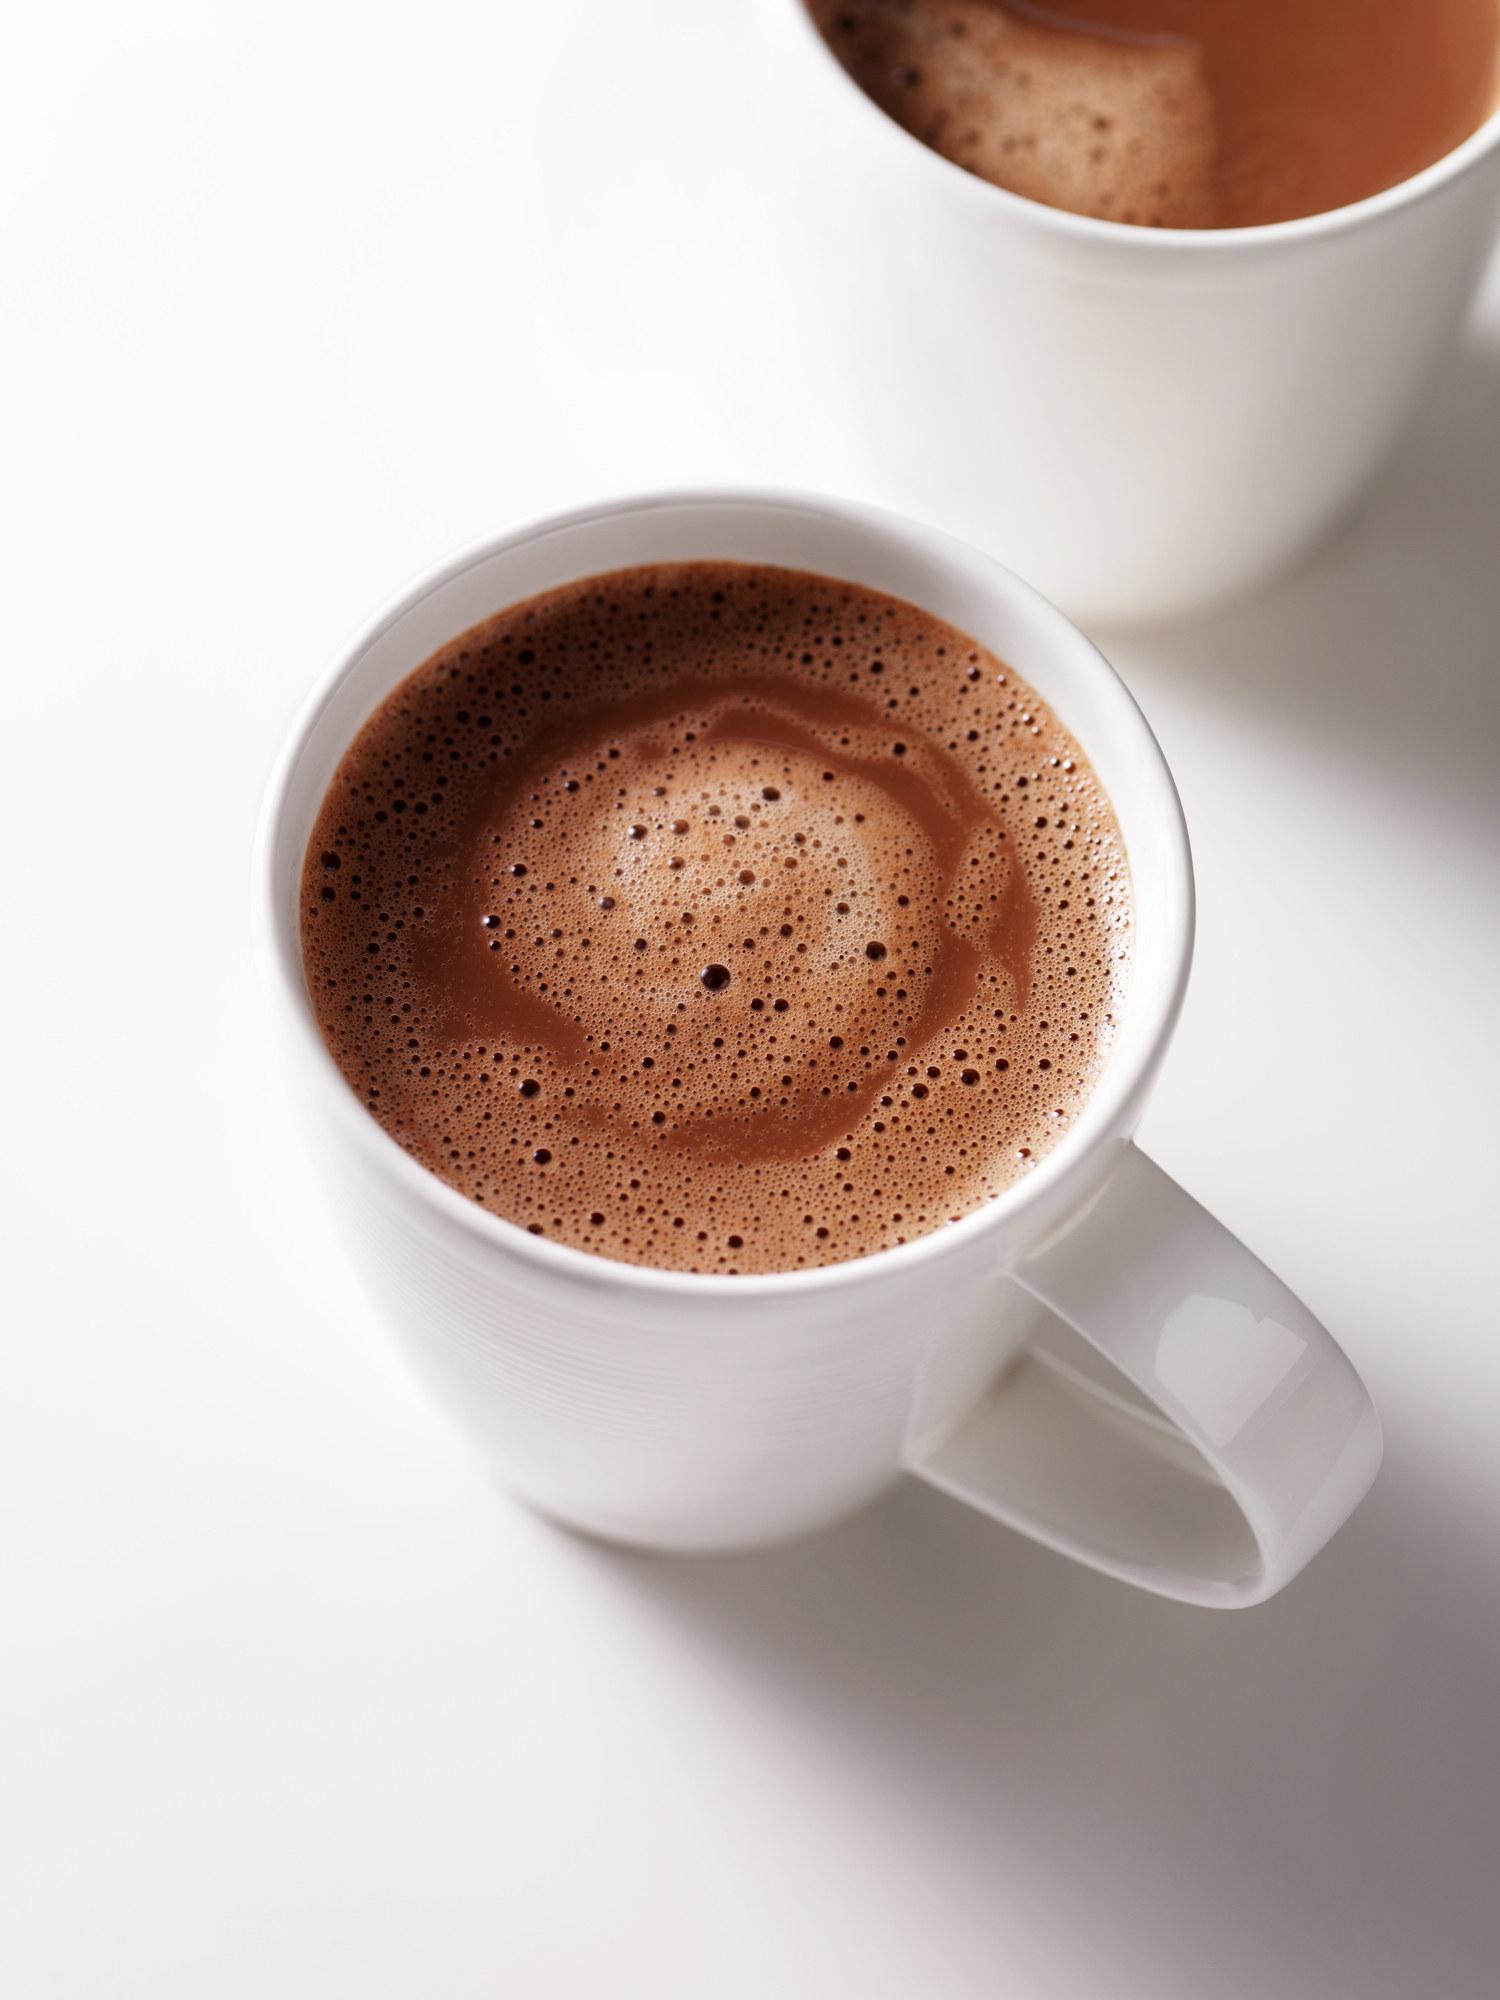 Two mugs of hot chocolate.